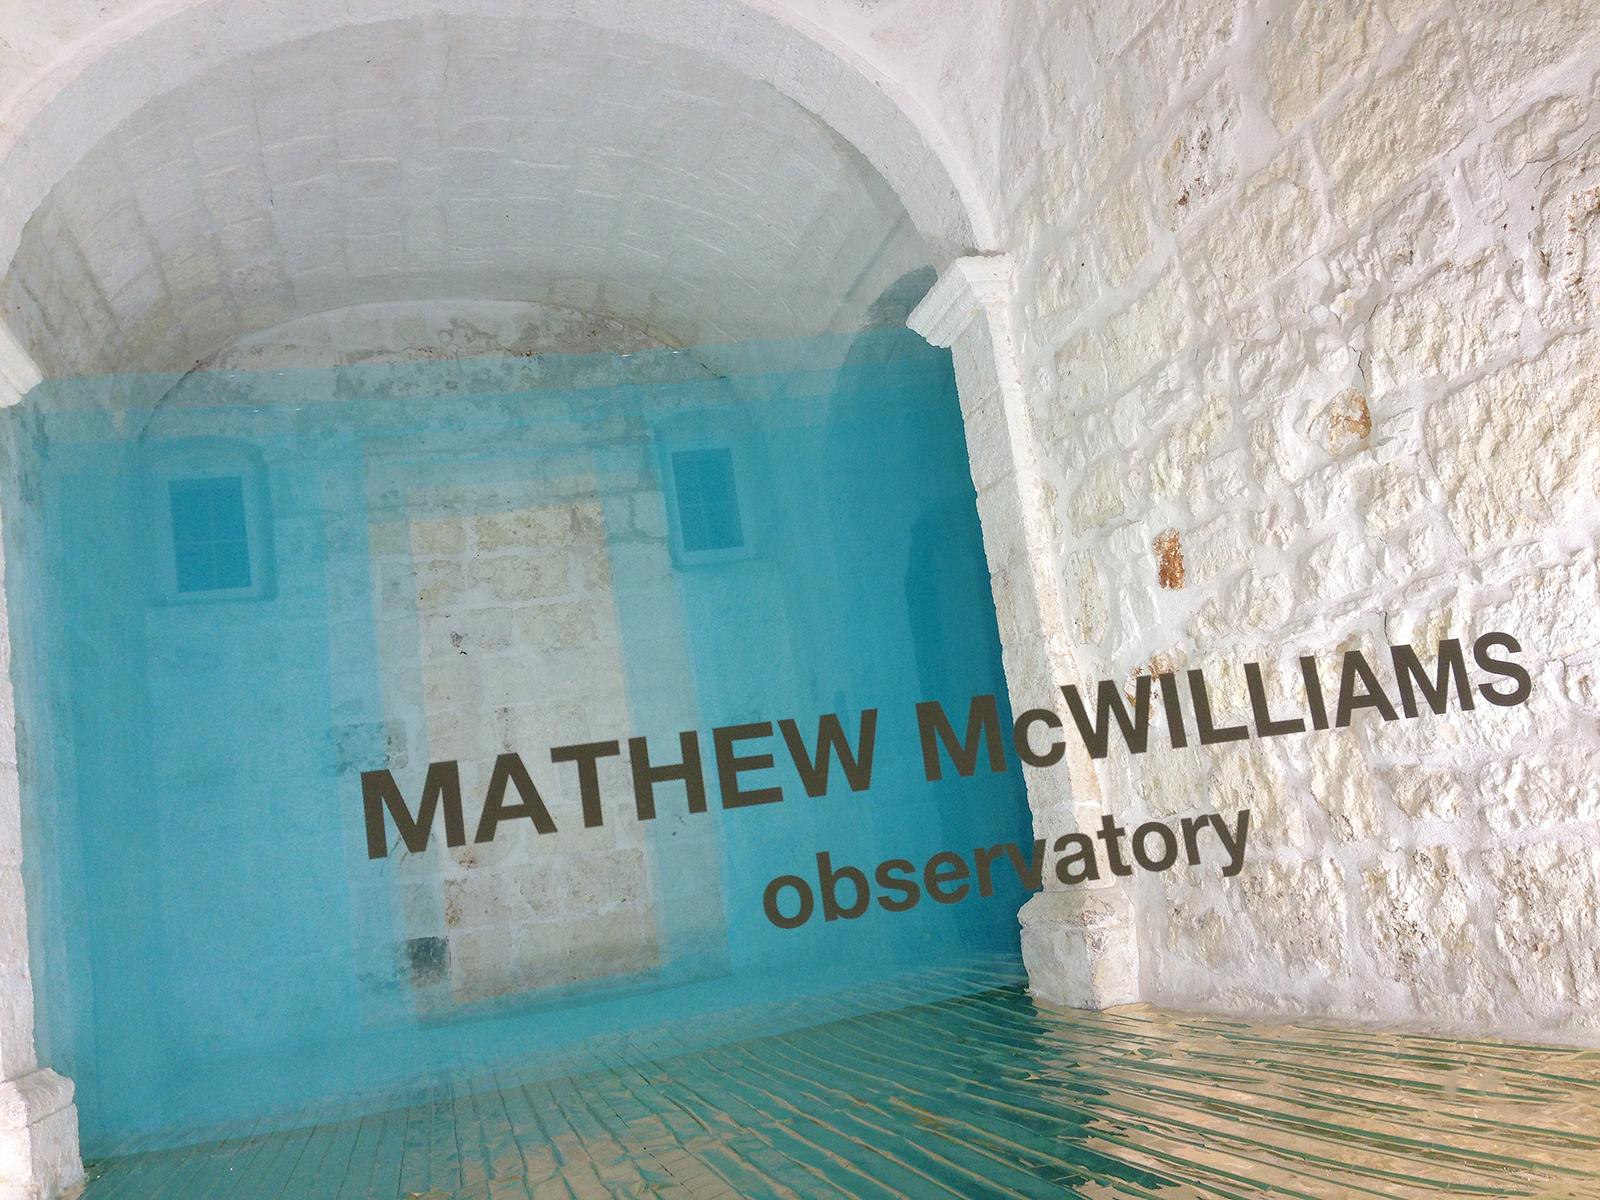 Mathew McWilliams, observatory